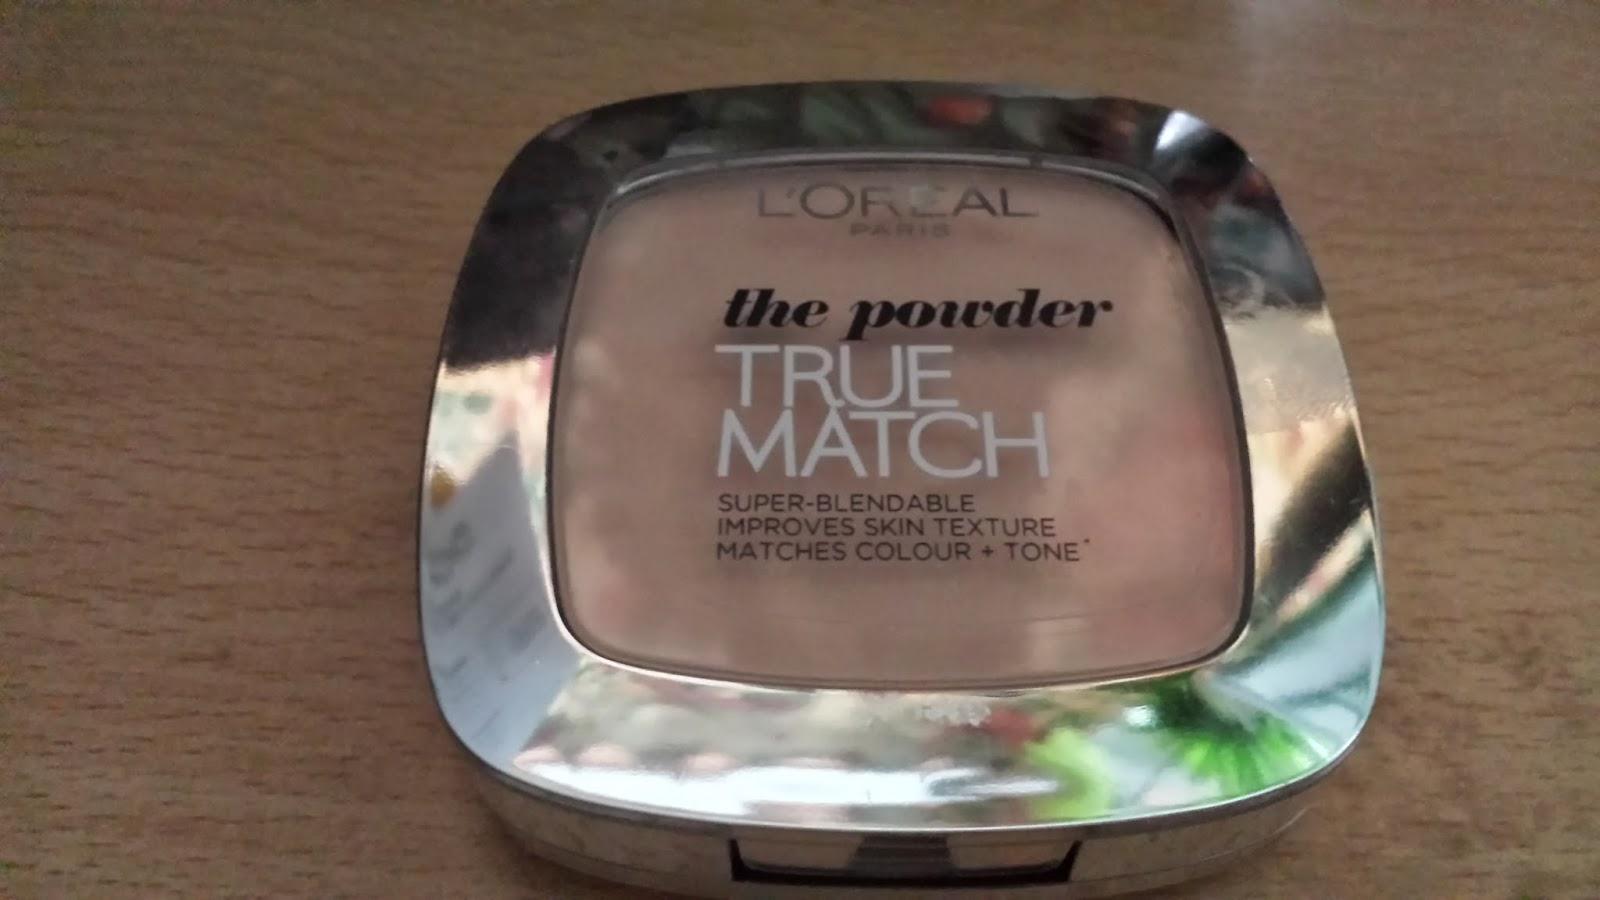 L'Oreal true match powder review